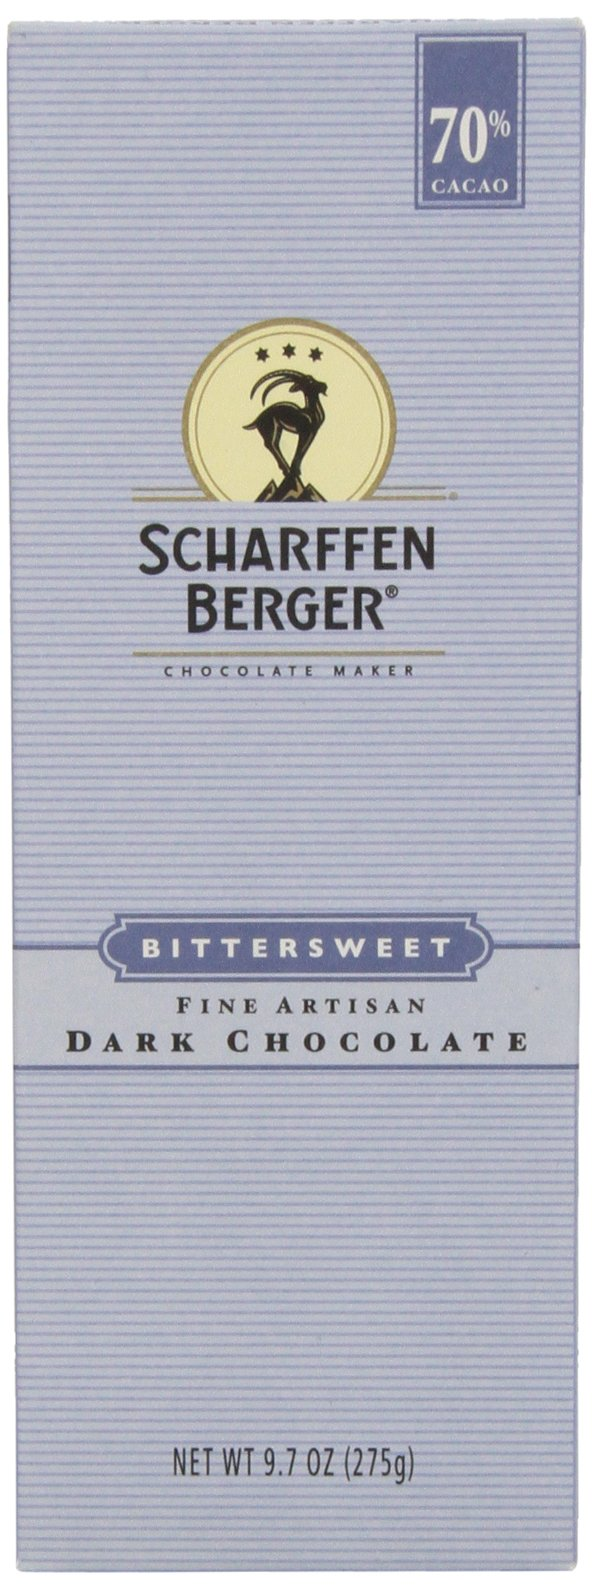 Scharffen Berger Baking Bar, Bittersweet Dark Chocolate (70% Cacao), 9.7-Ounce Packages (Pack of 3)